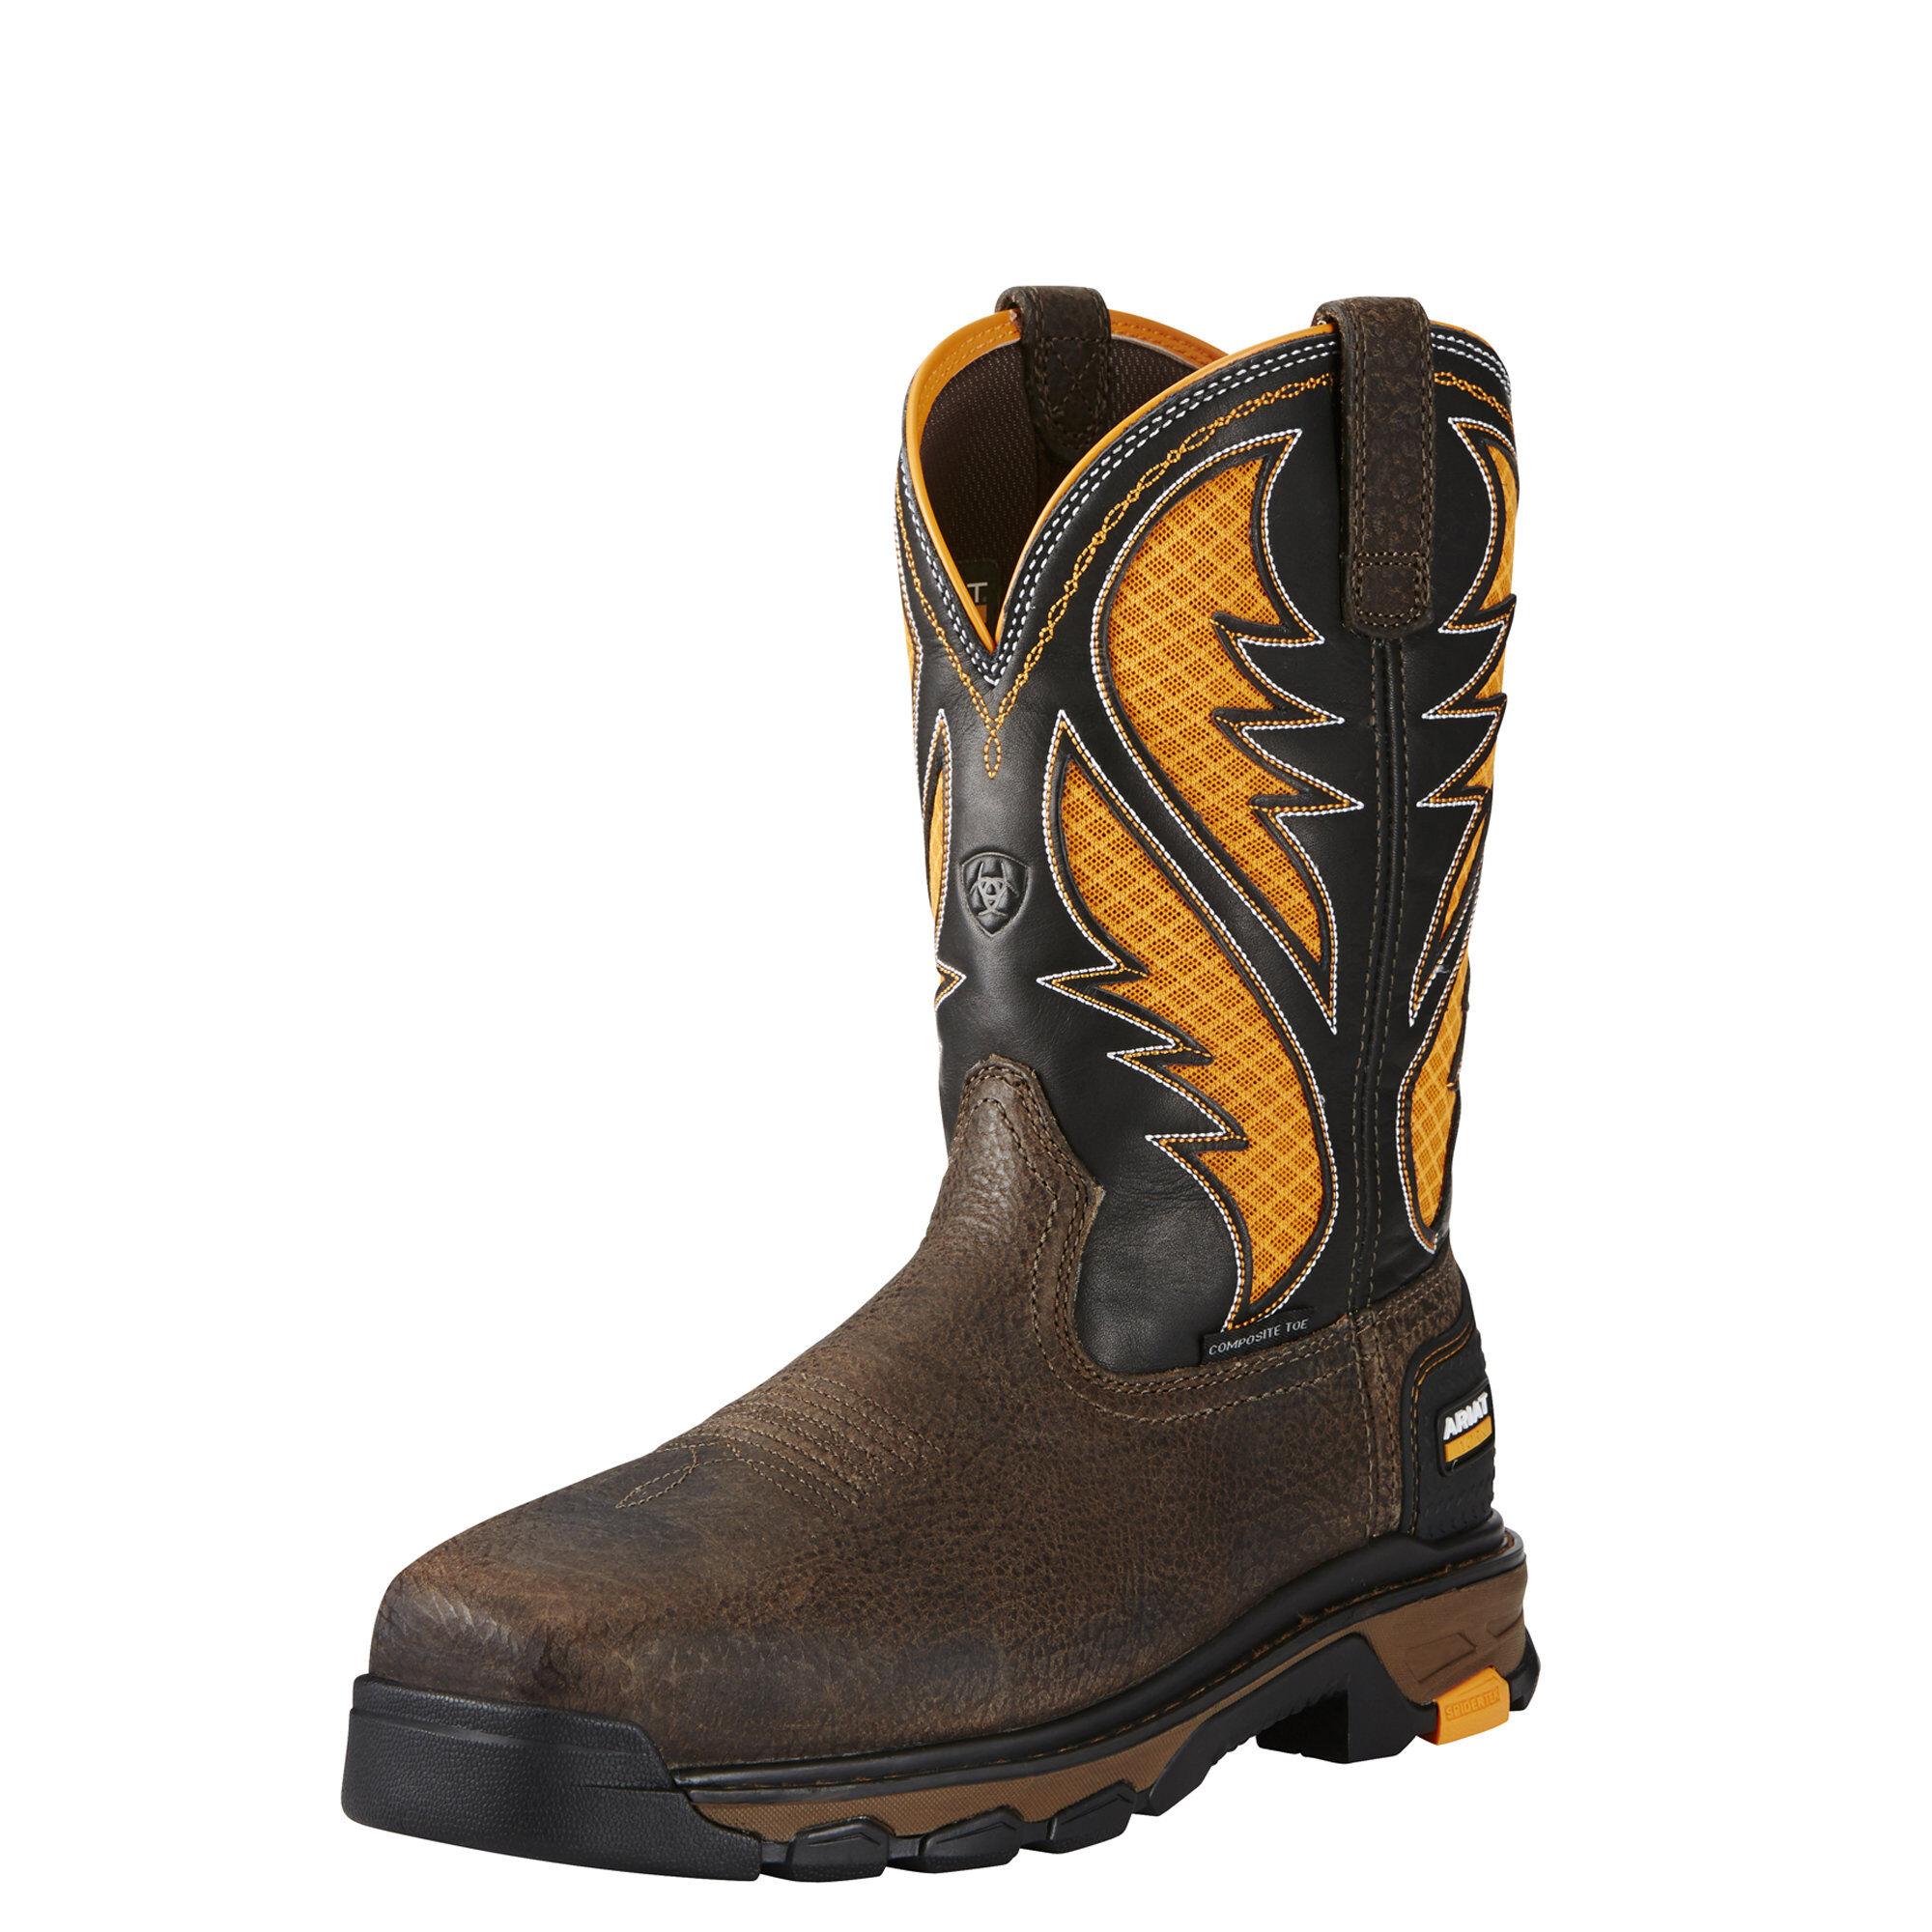 10024953 Details about  /Ariat Men/'s Waterproof Edge LTE Chukka Boot Composite Toe